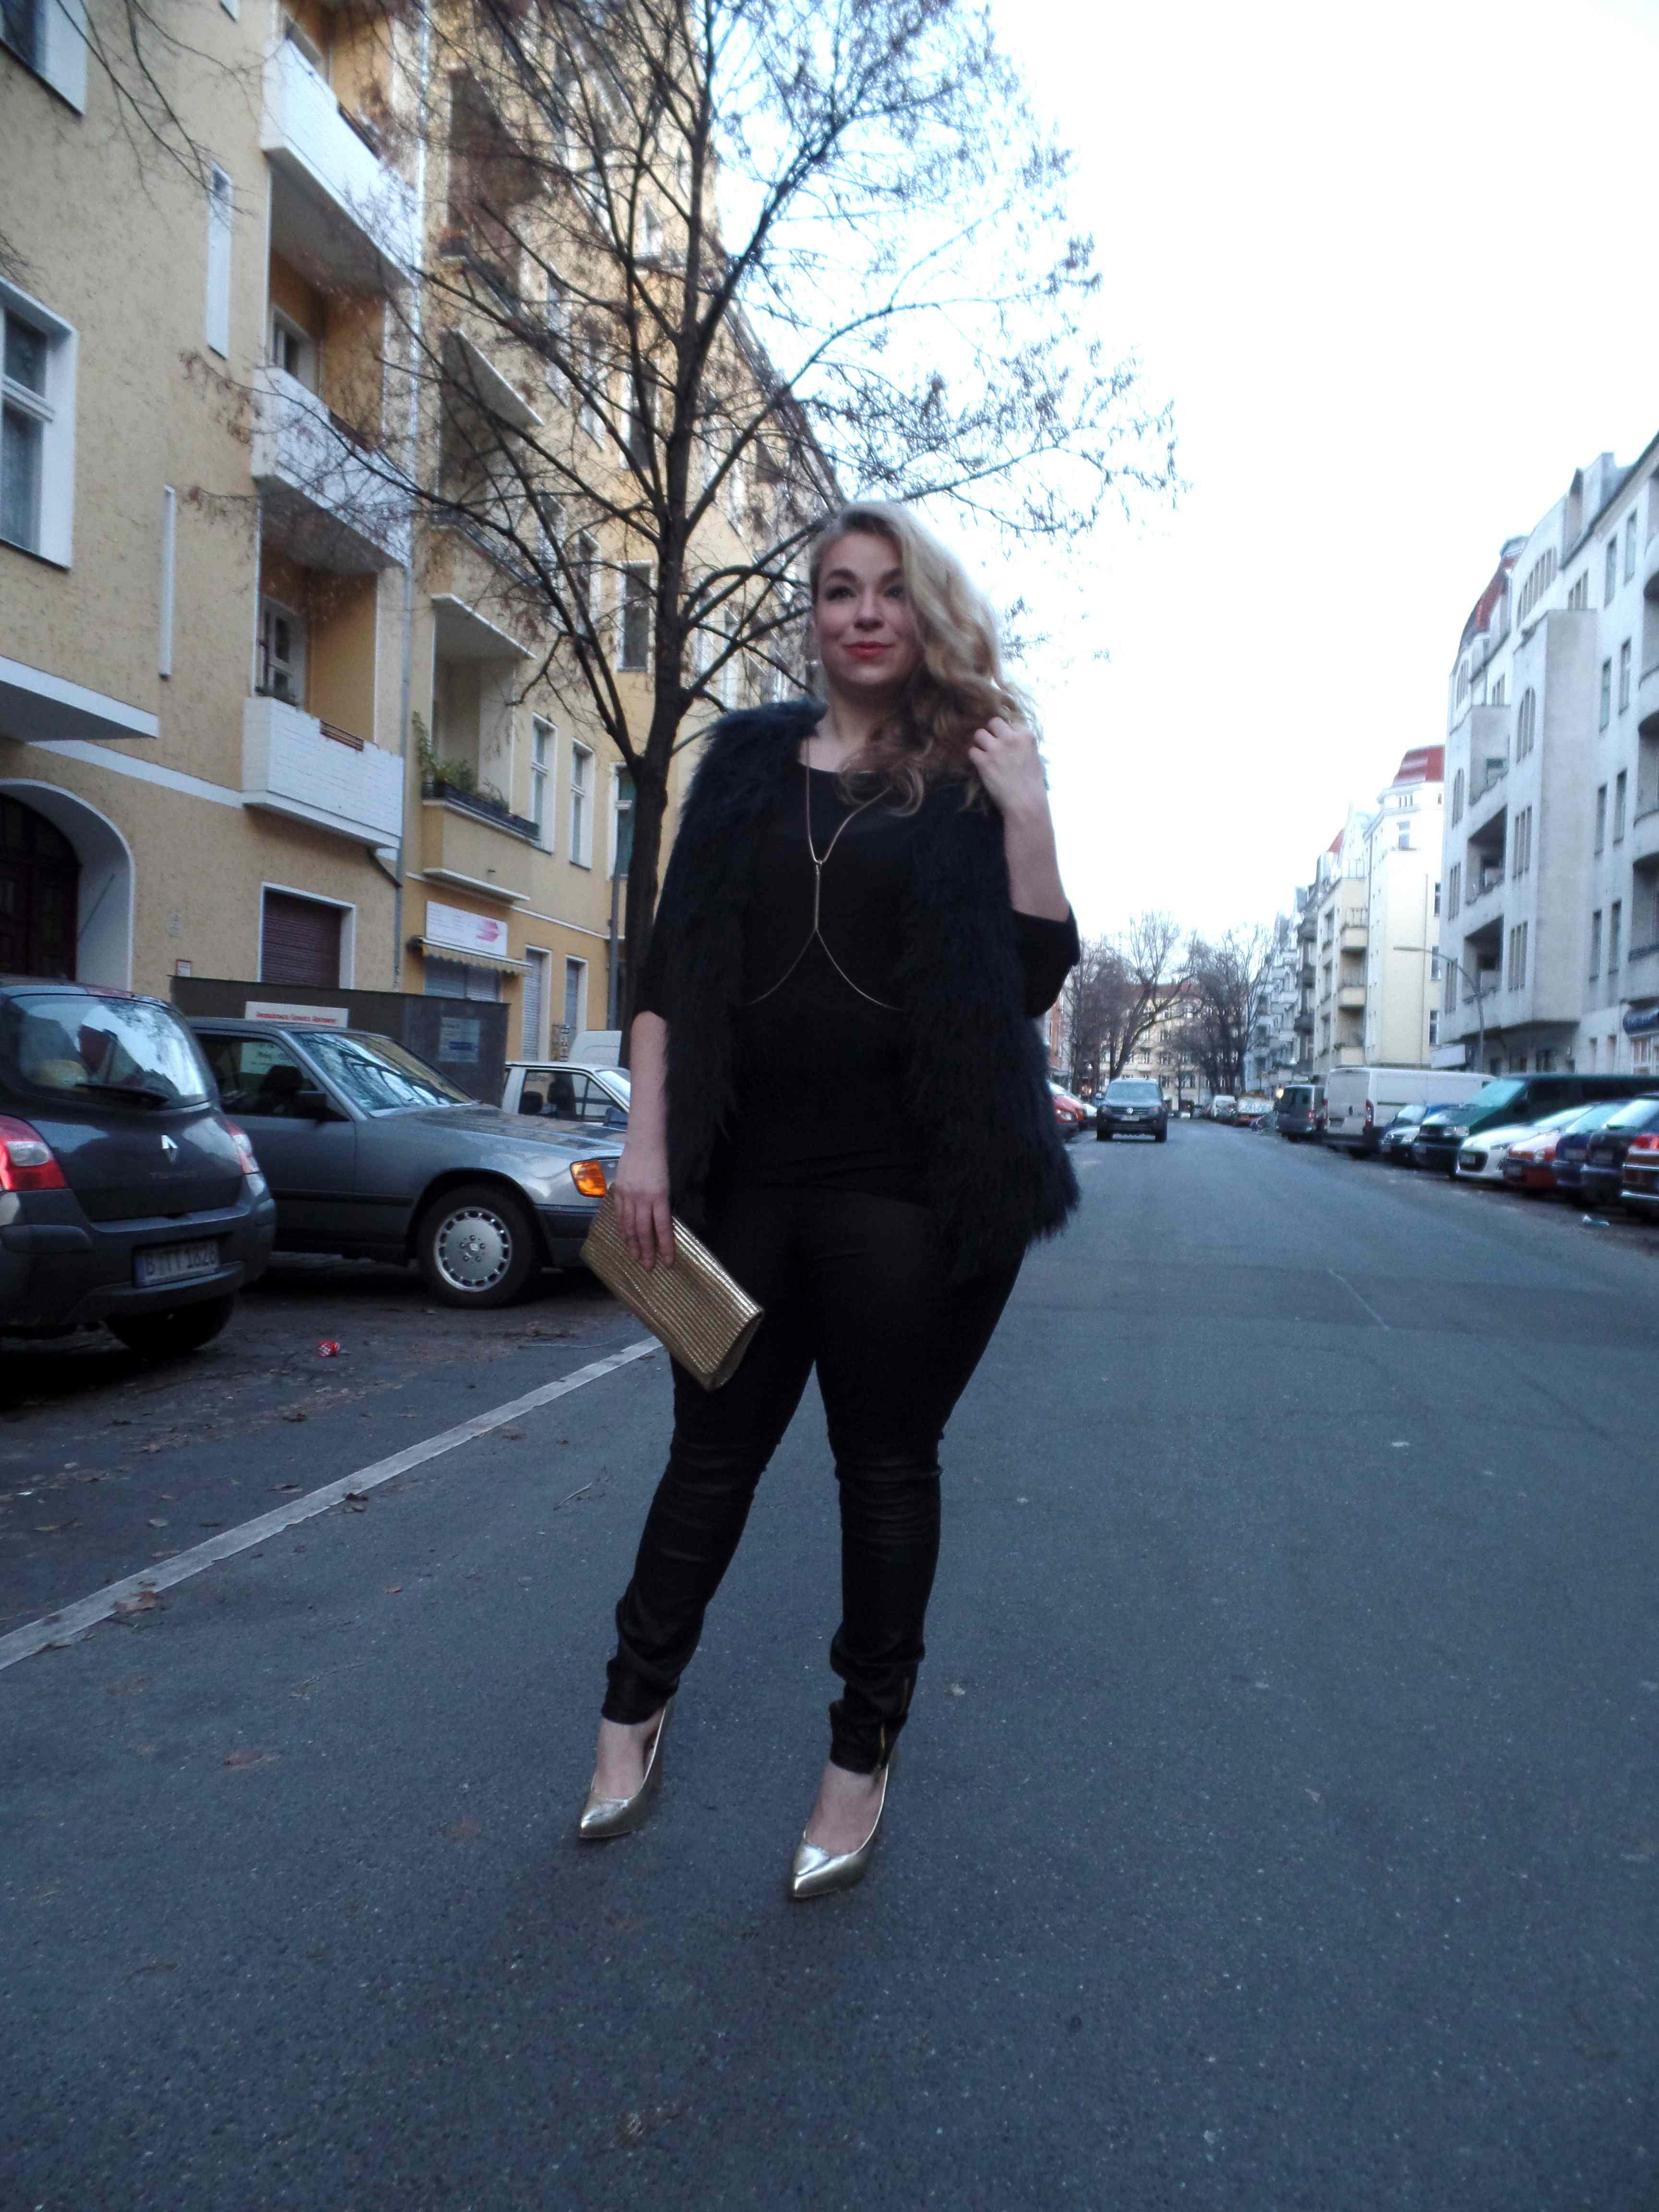 pogorzelski-megabambi-caterina-Blog-Outift-Berlin